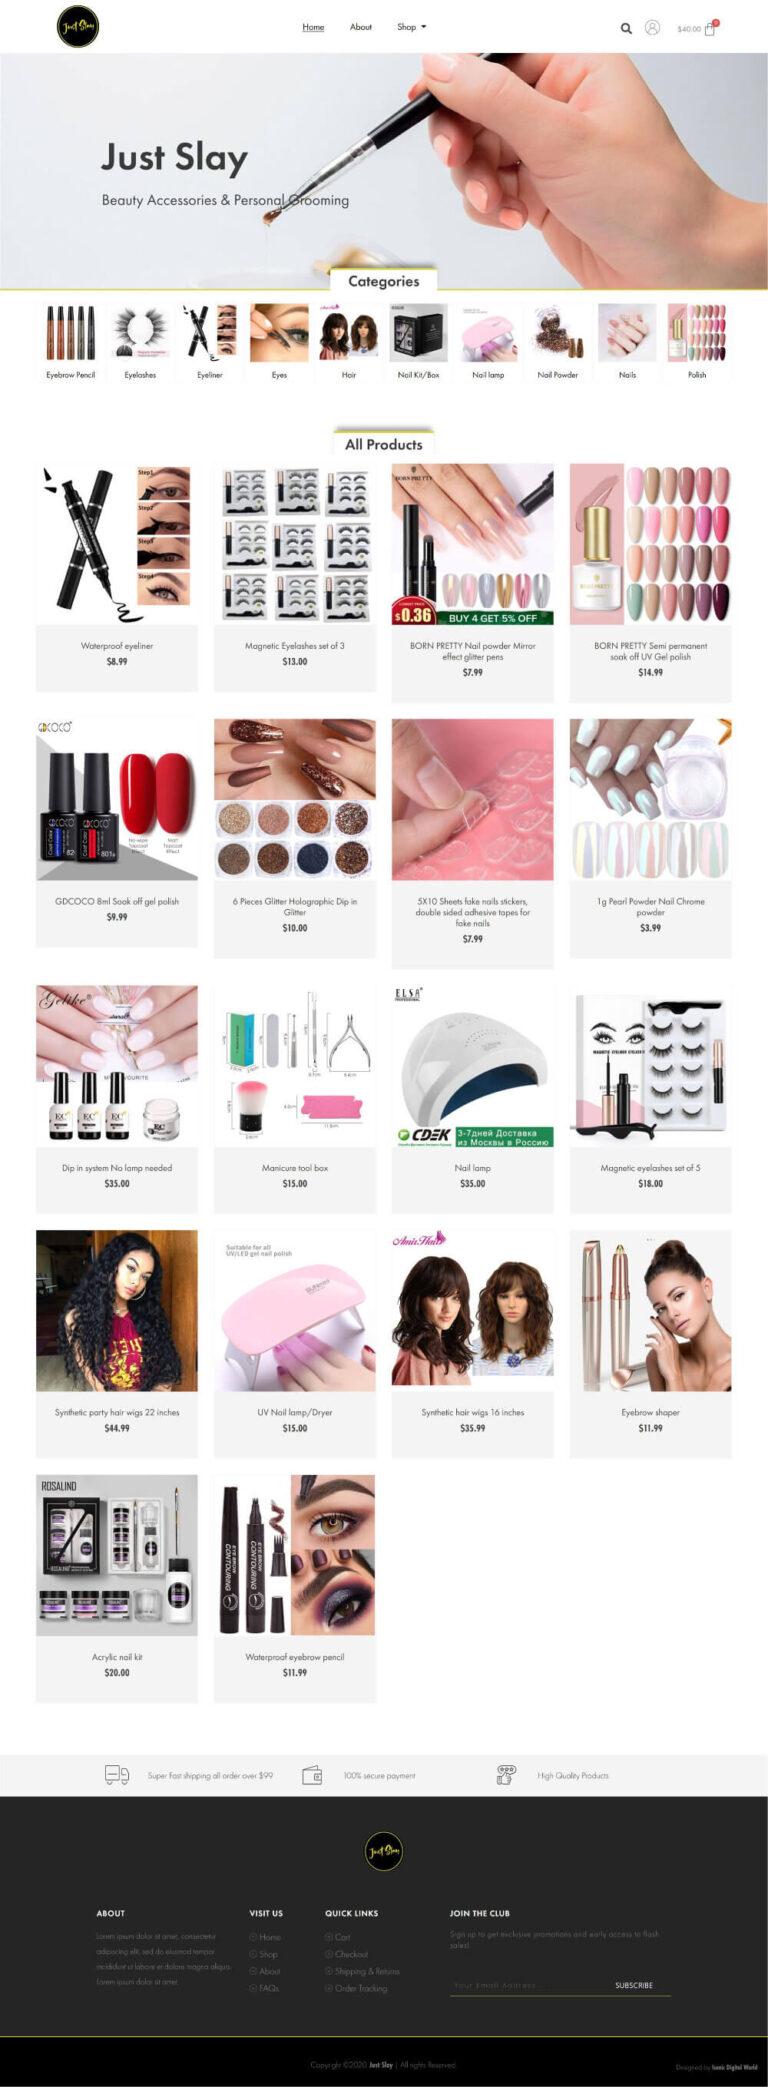 Just Slay New Website Design - Homepage